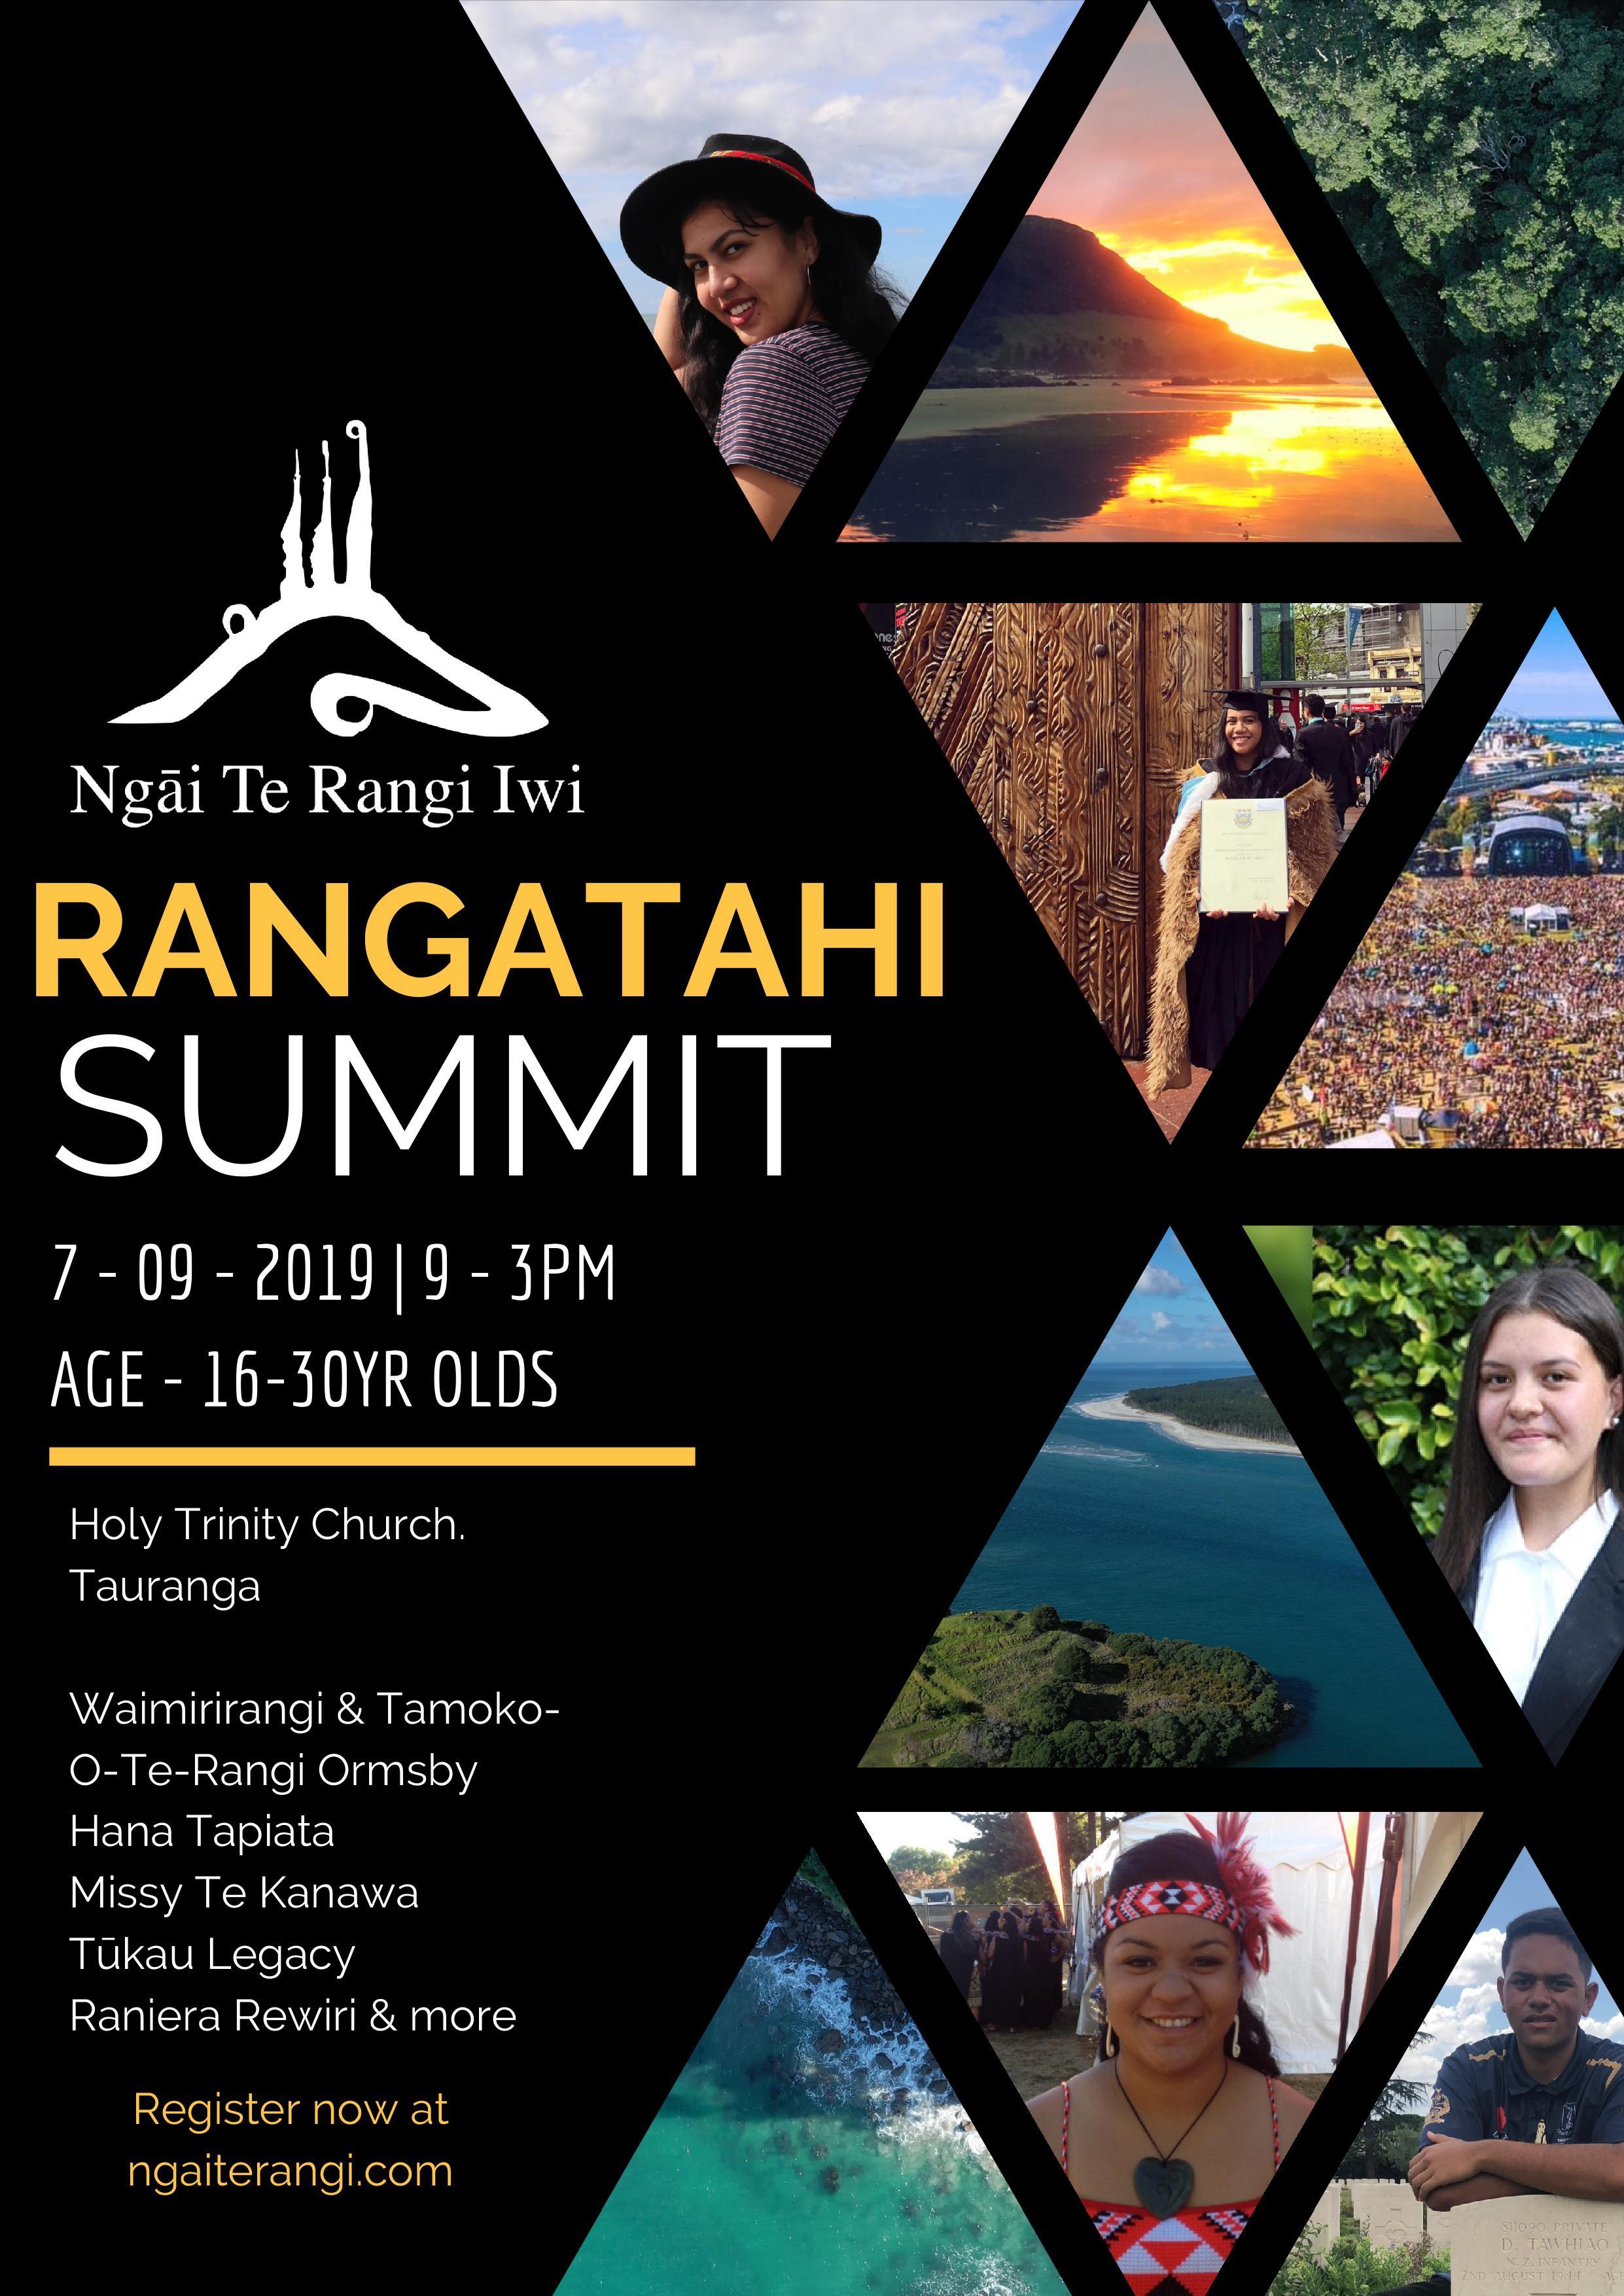 Ngai Te Rangi Rangatahi Summit 2019 Flyer.png